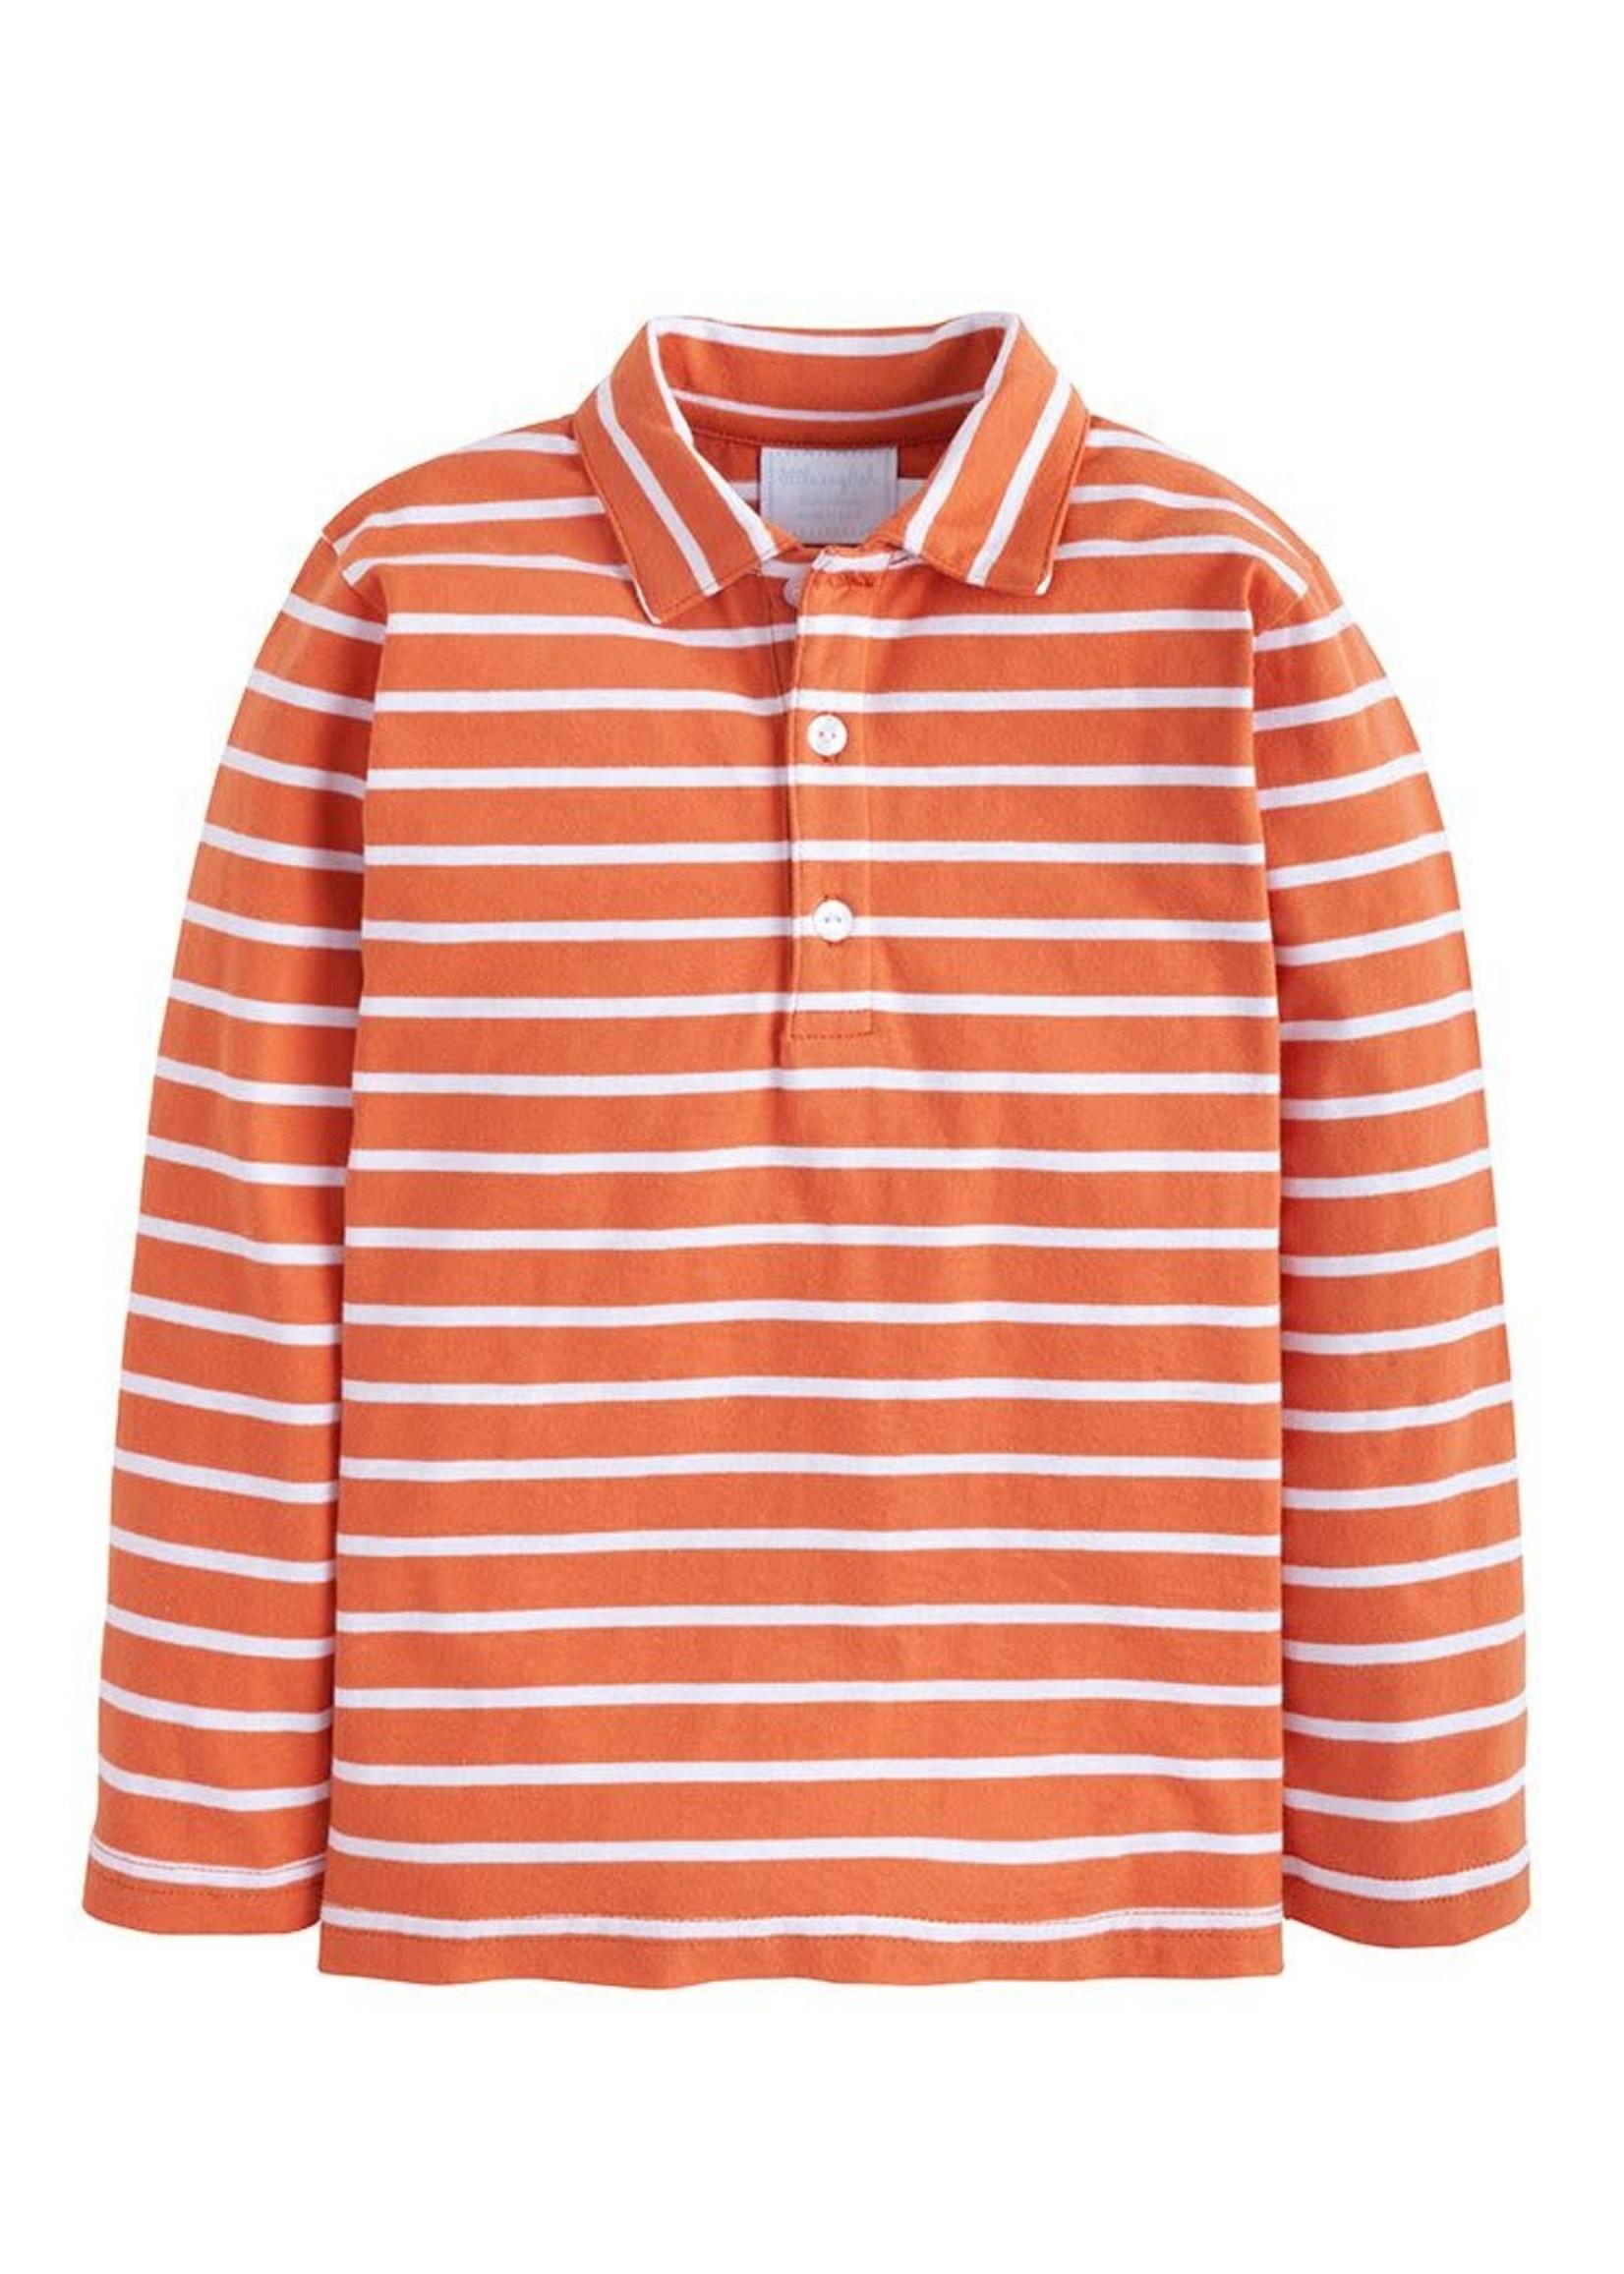 Little English Long Sleeve Striped Polo - Rust